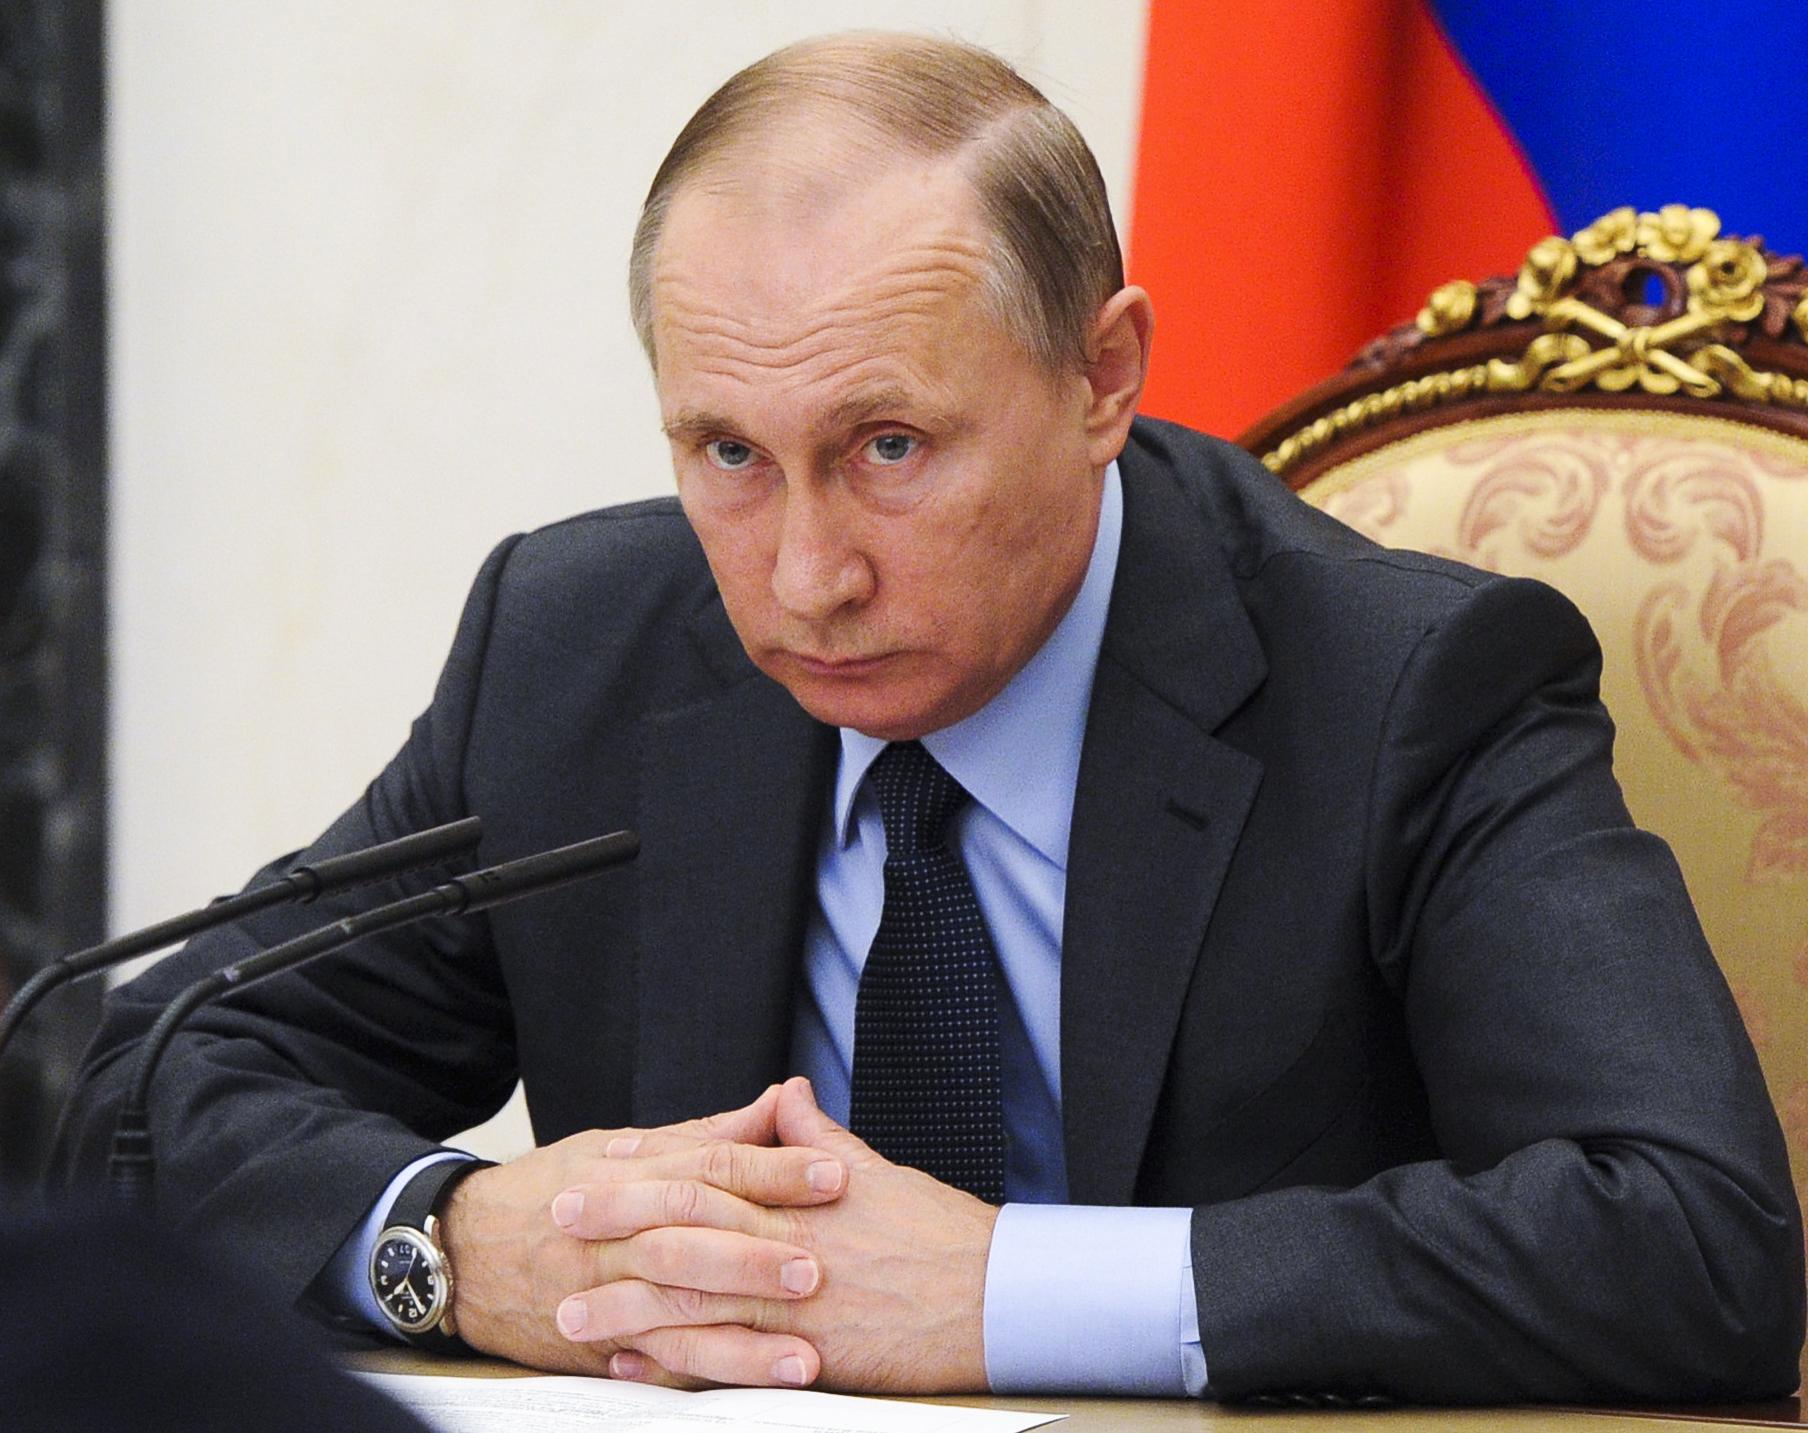 http://media.washtimes.com.s3.amazonaws.com/media/image/2016/09/07/Russia_Putin.JPEG-f16b6.jpg